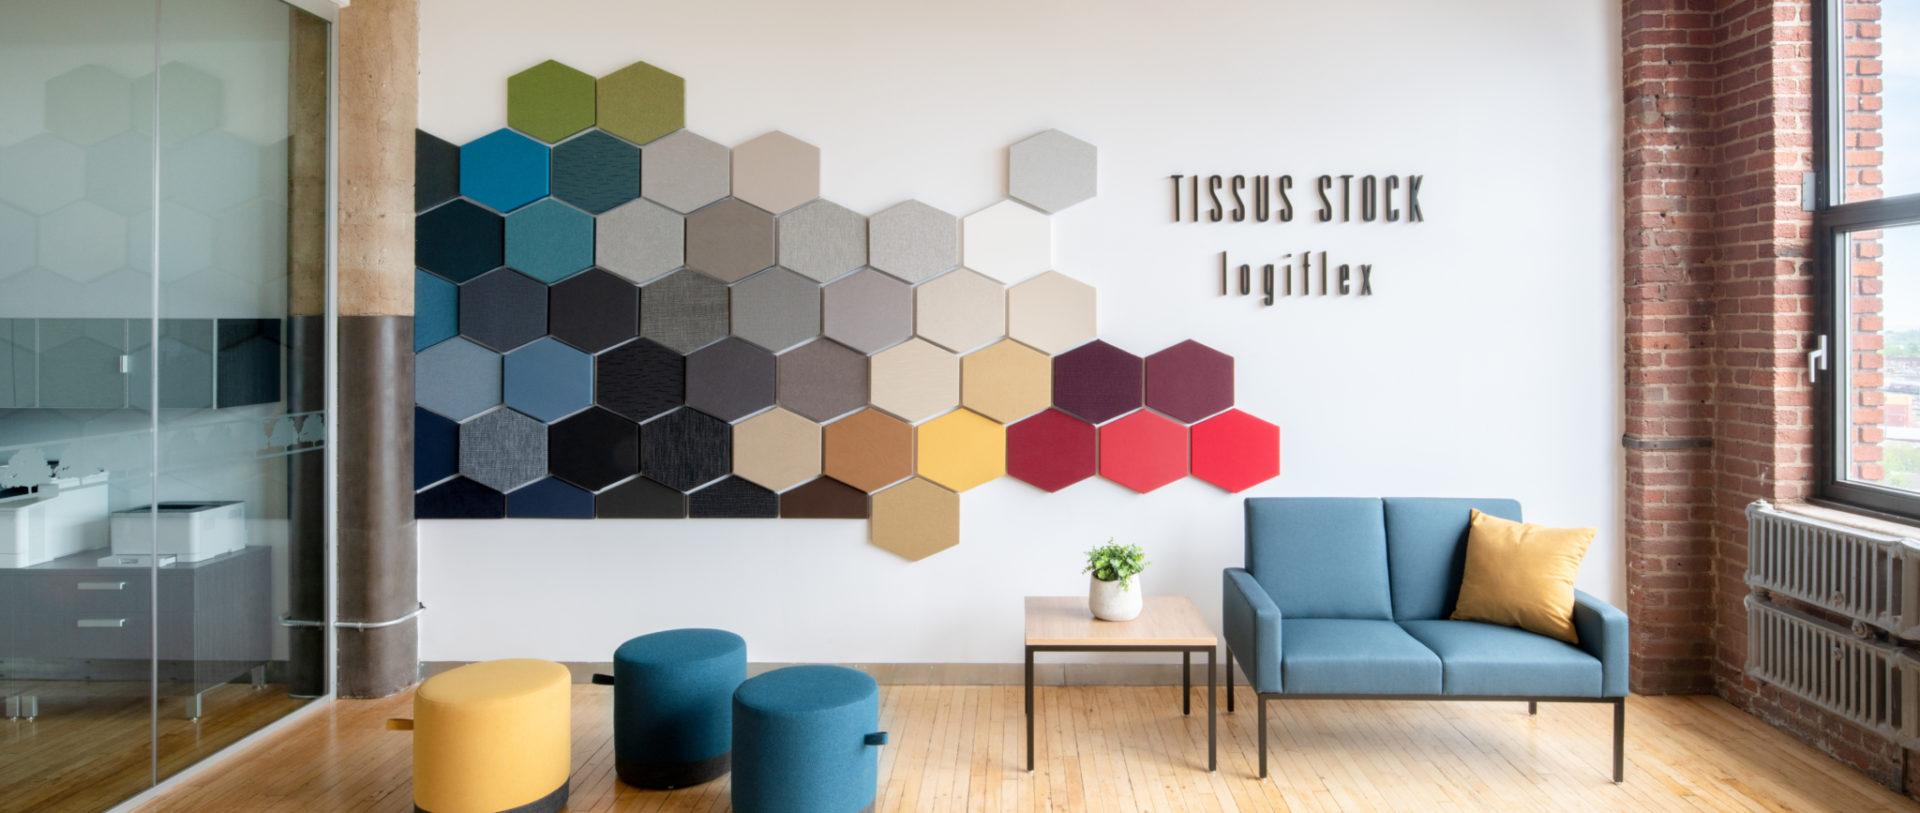 Logiflex New Tissus Stock